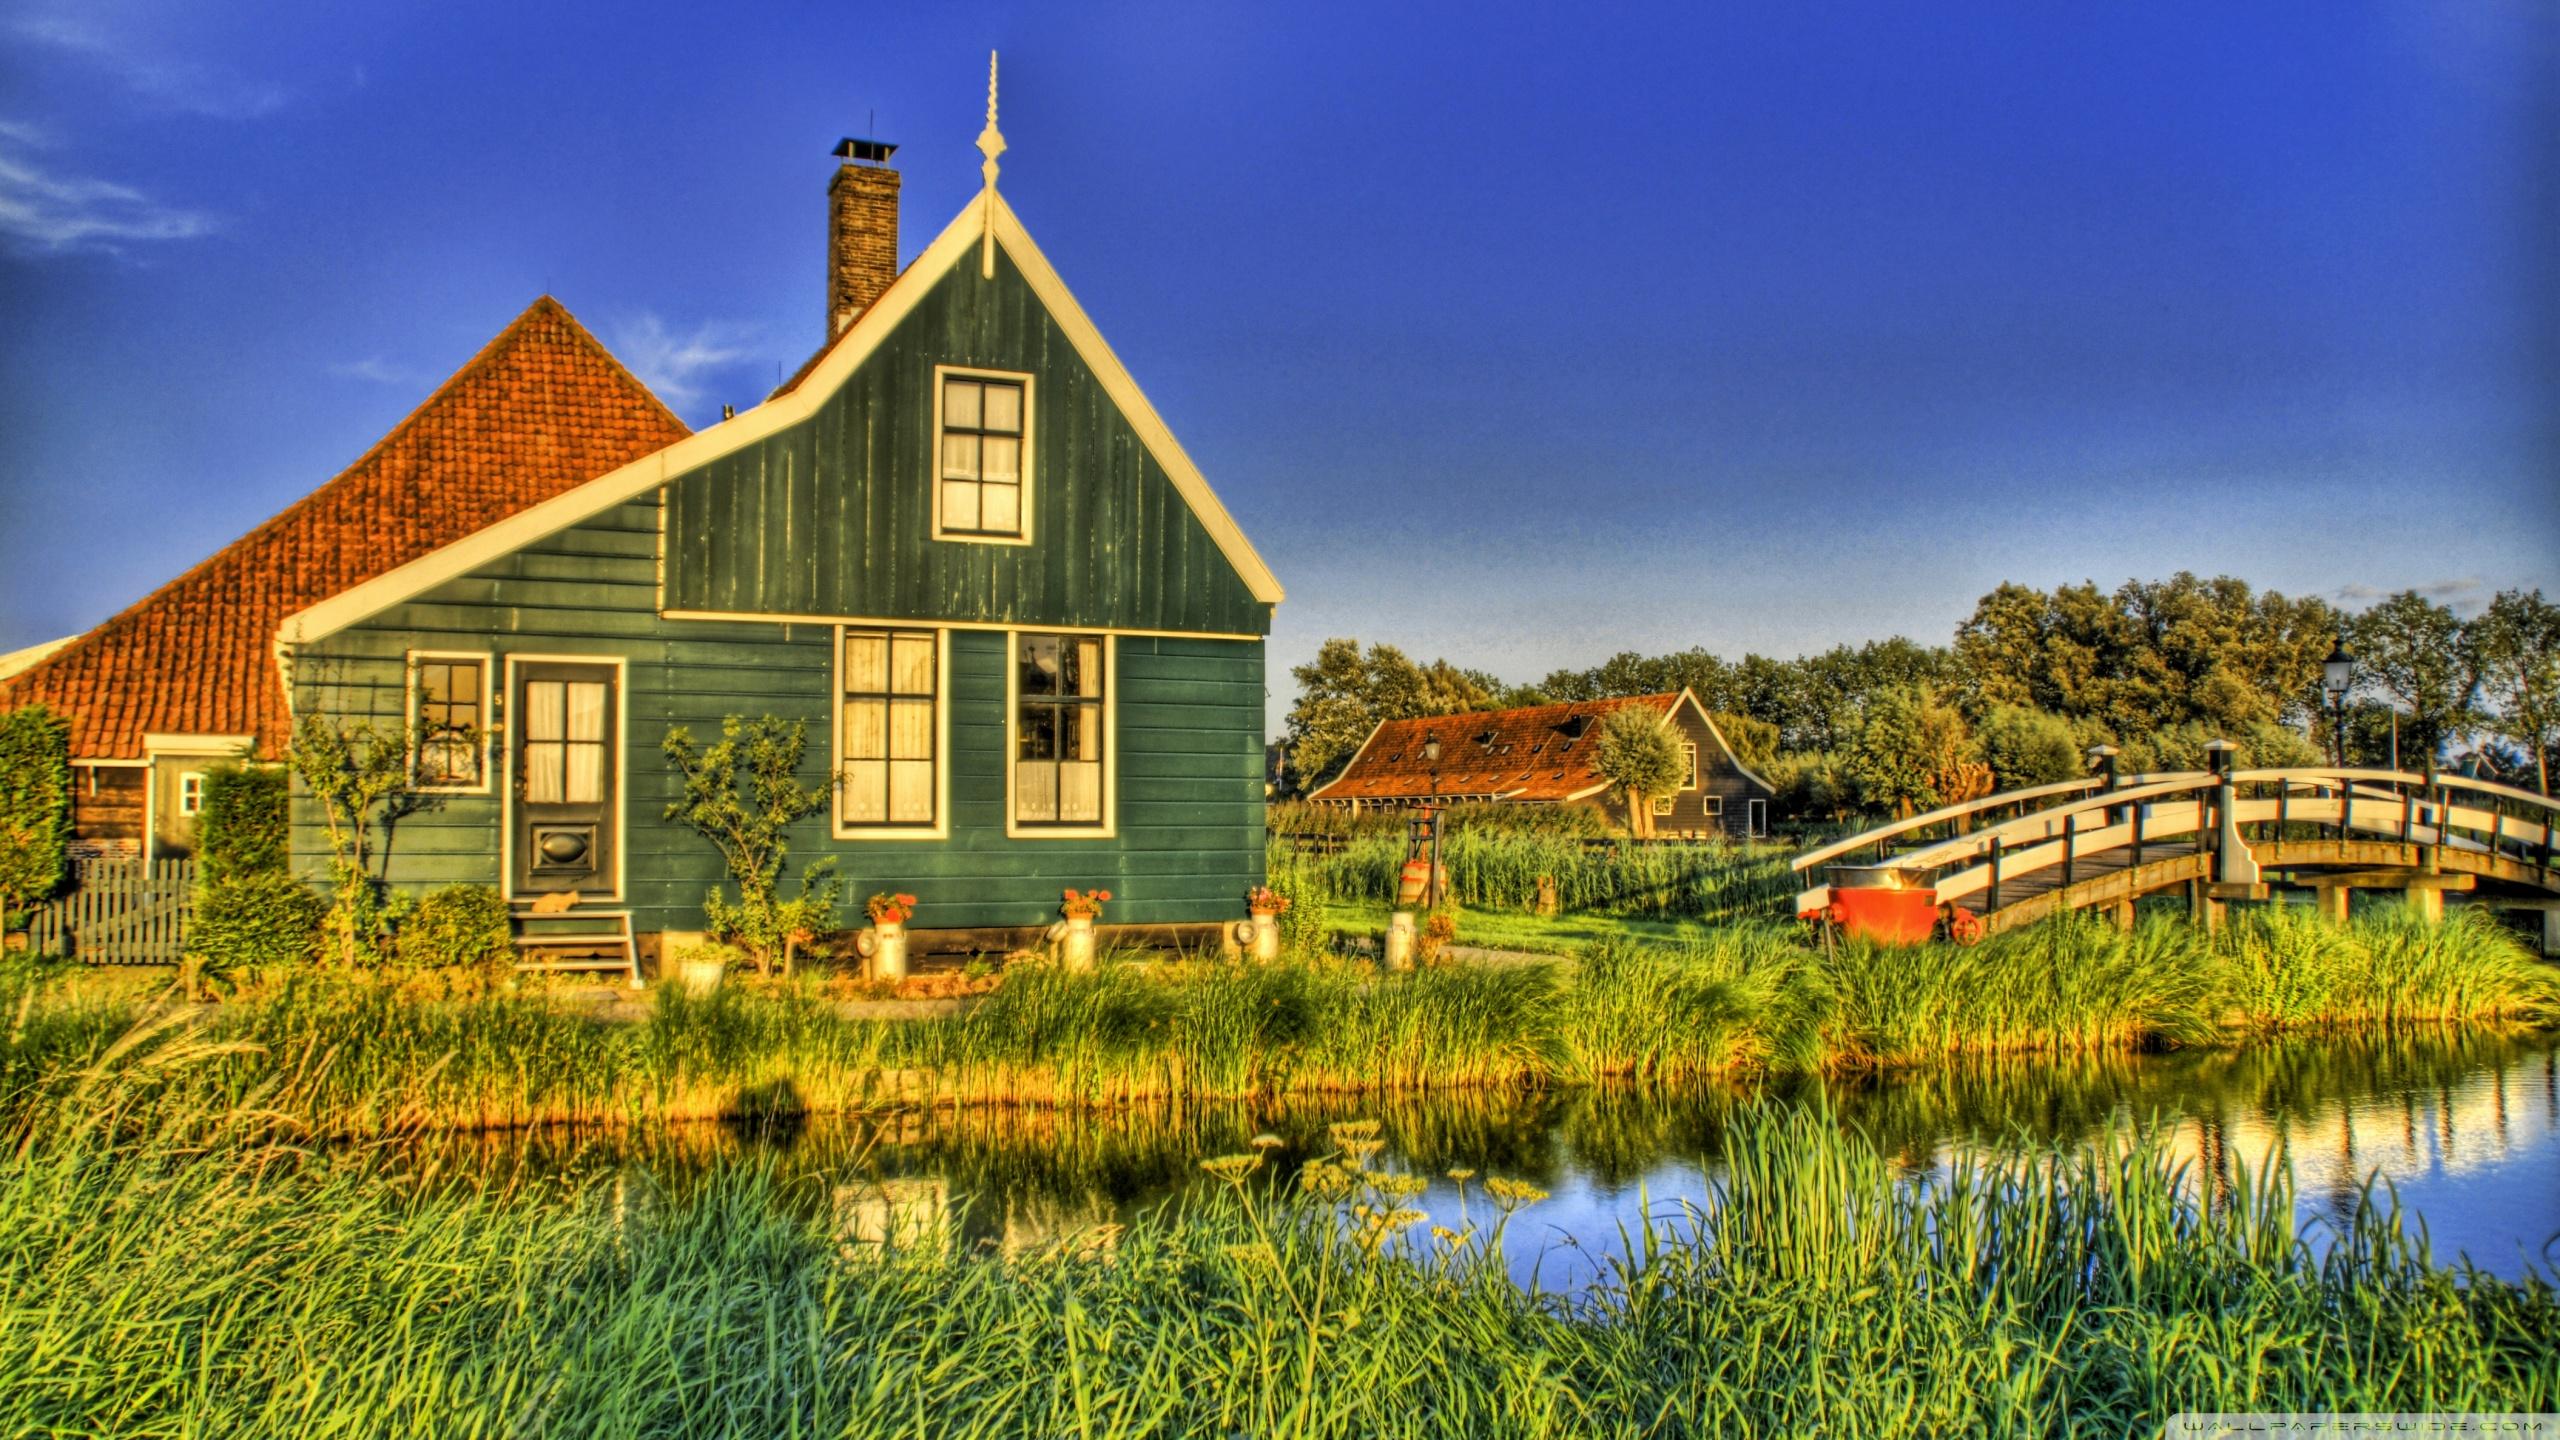 Holland Farmhouse 4K HD Desktop Wallpaper for 4K Ultra HD TV 2560x1440